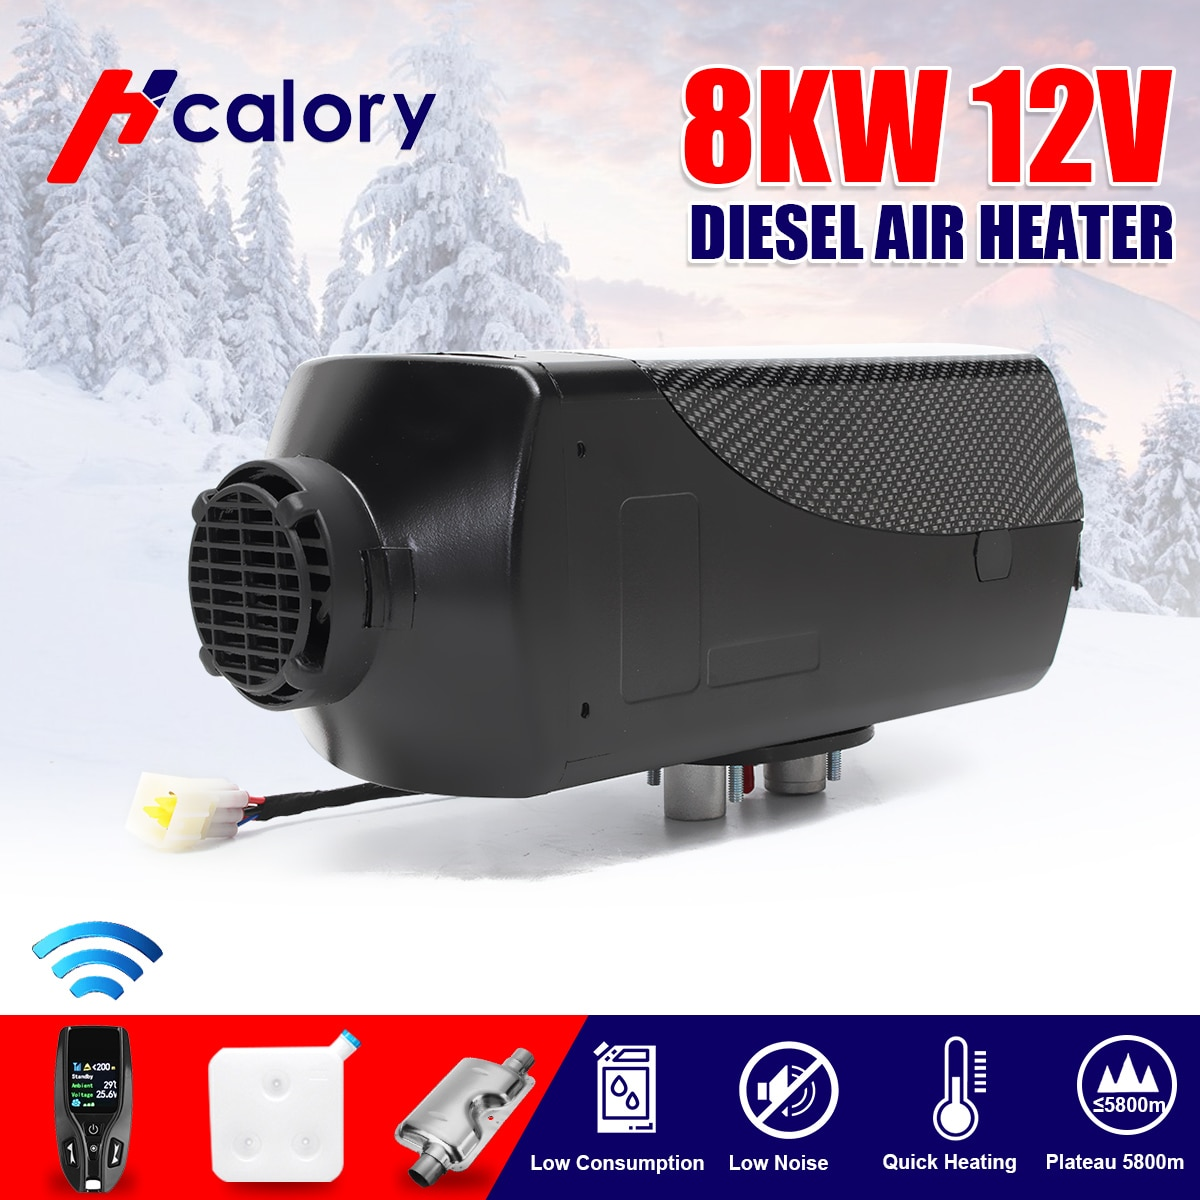 Hcalory calentador de coche 12V 12V 8000W aire calentador diesel centralitas aparcamiento calentador con Control remoto LCD Monitor para webastos Motor